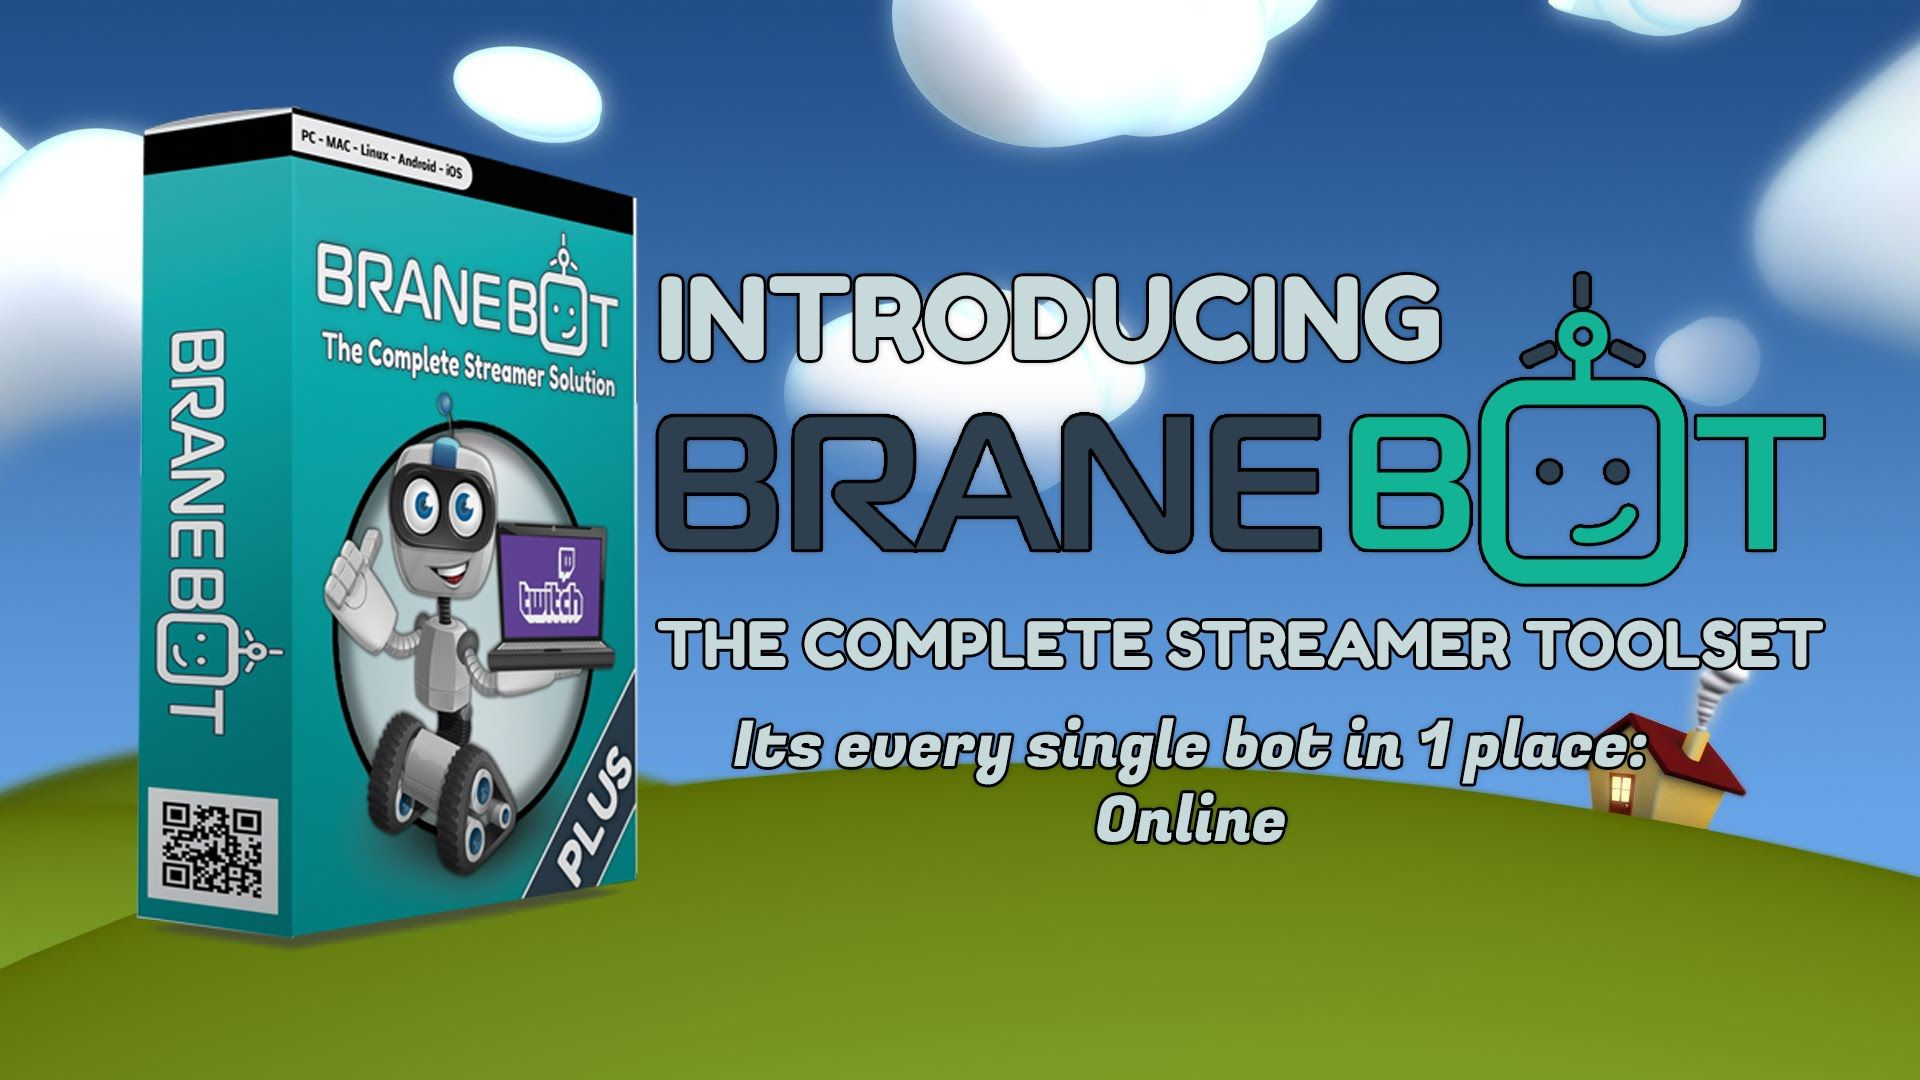 BraneBot, or Brane for short